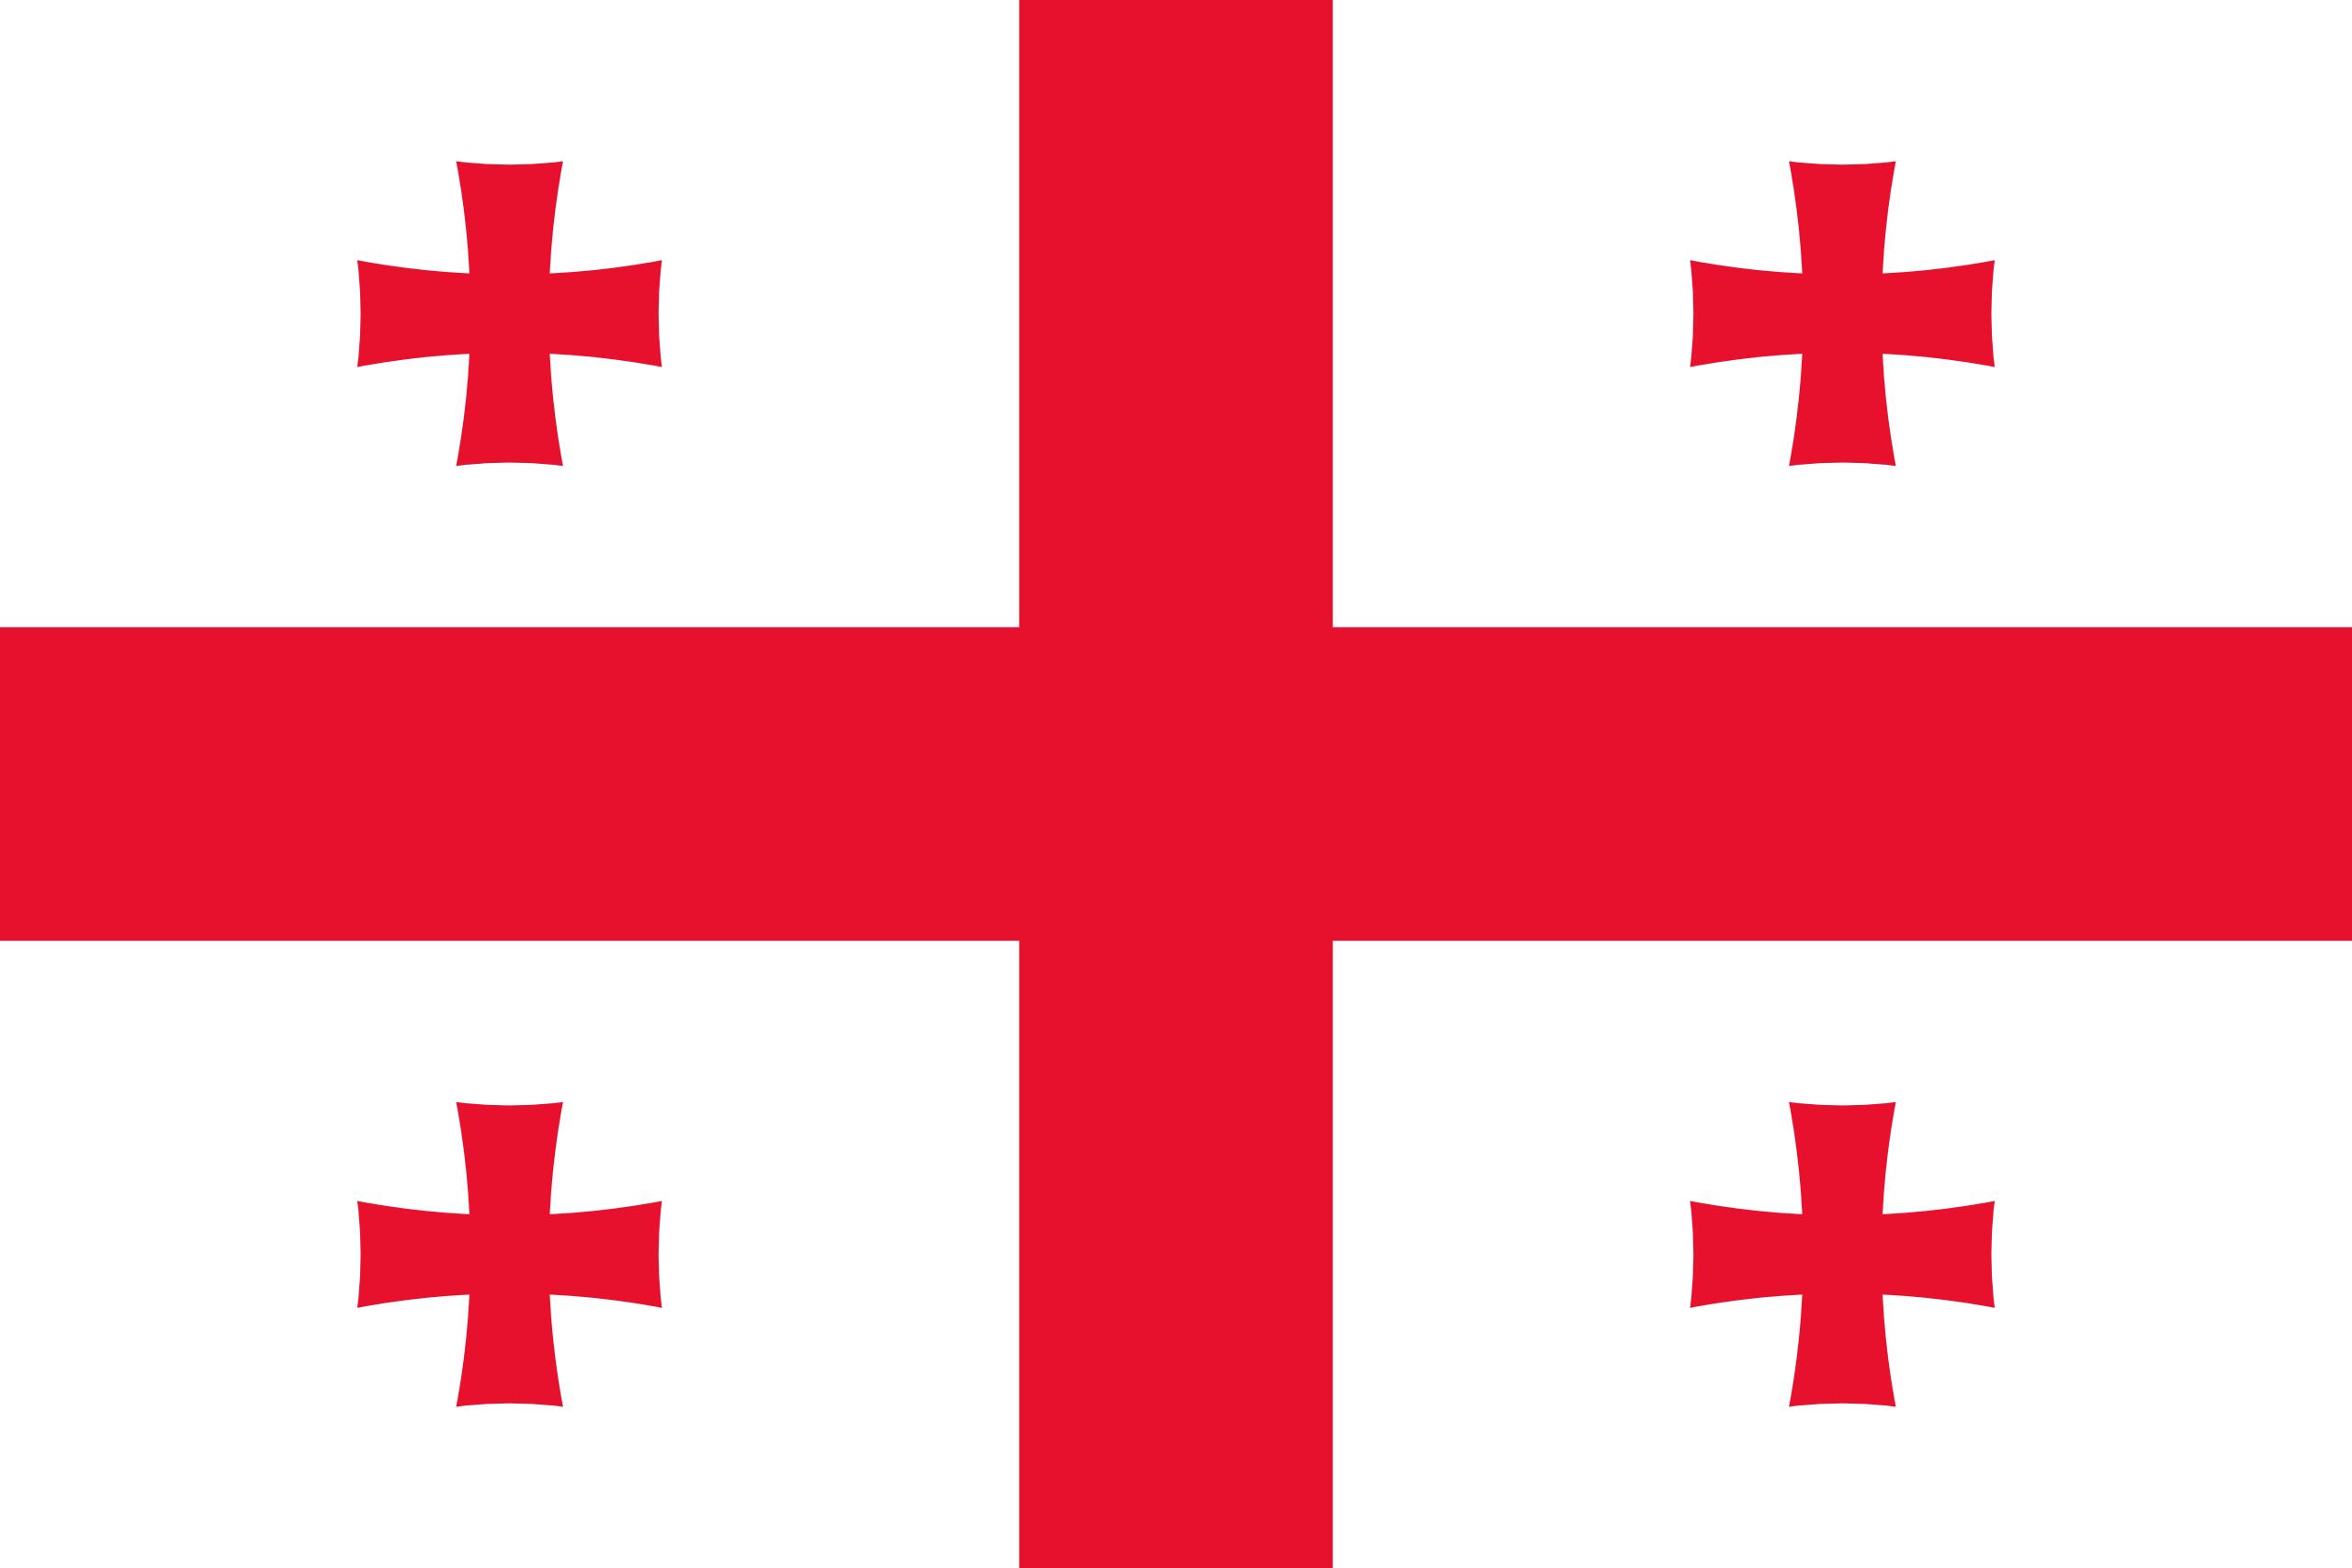 Georgia, paese, emblema, logo, simbolo - Sfondi HD - Professor-falken.com